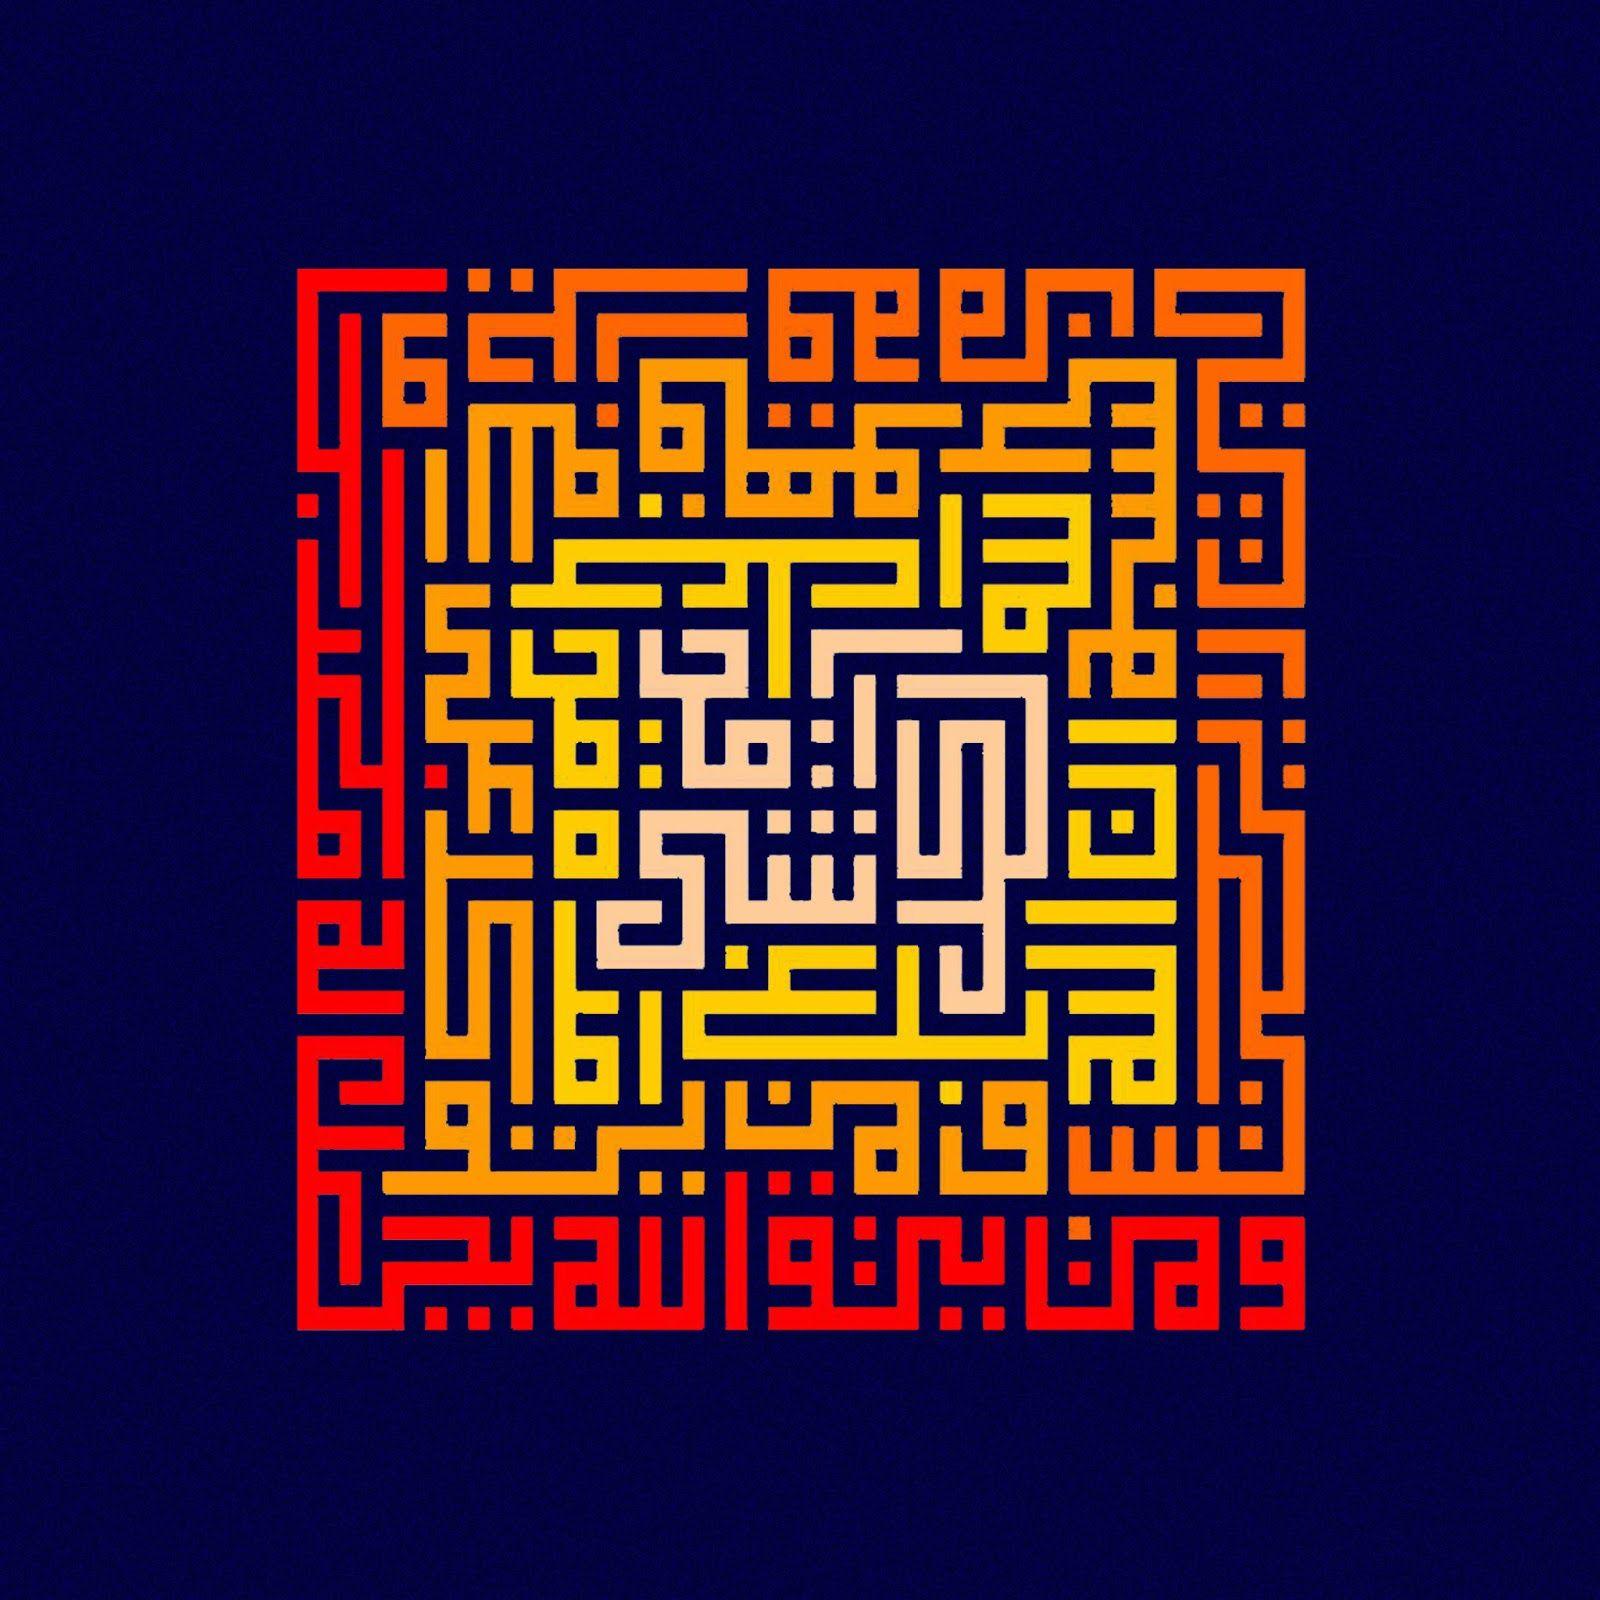 kufi art ayat seribu dinar Kaligrafi islam, Seni, Kaligrafi